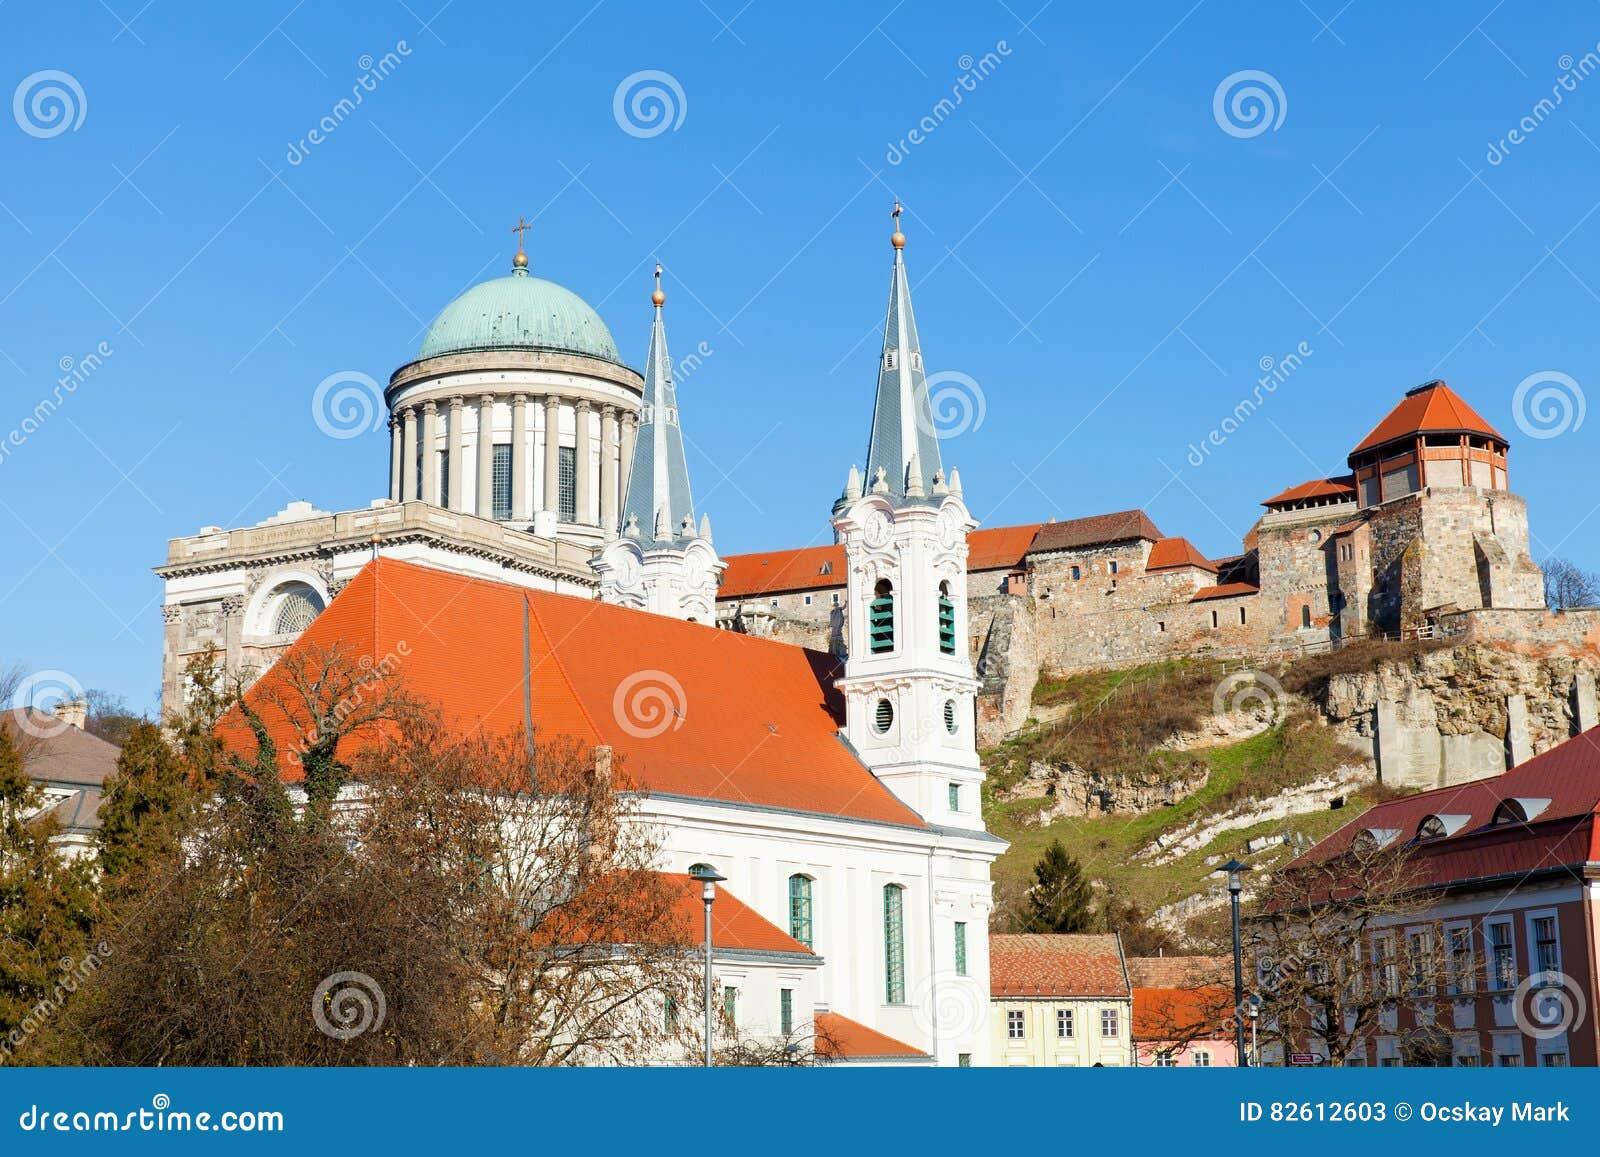 The Basilica in Esztergom